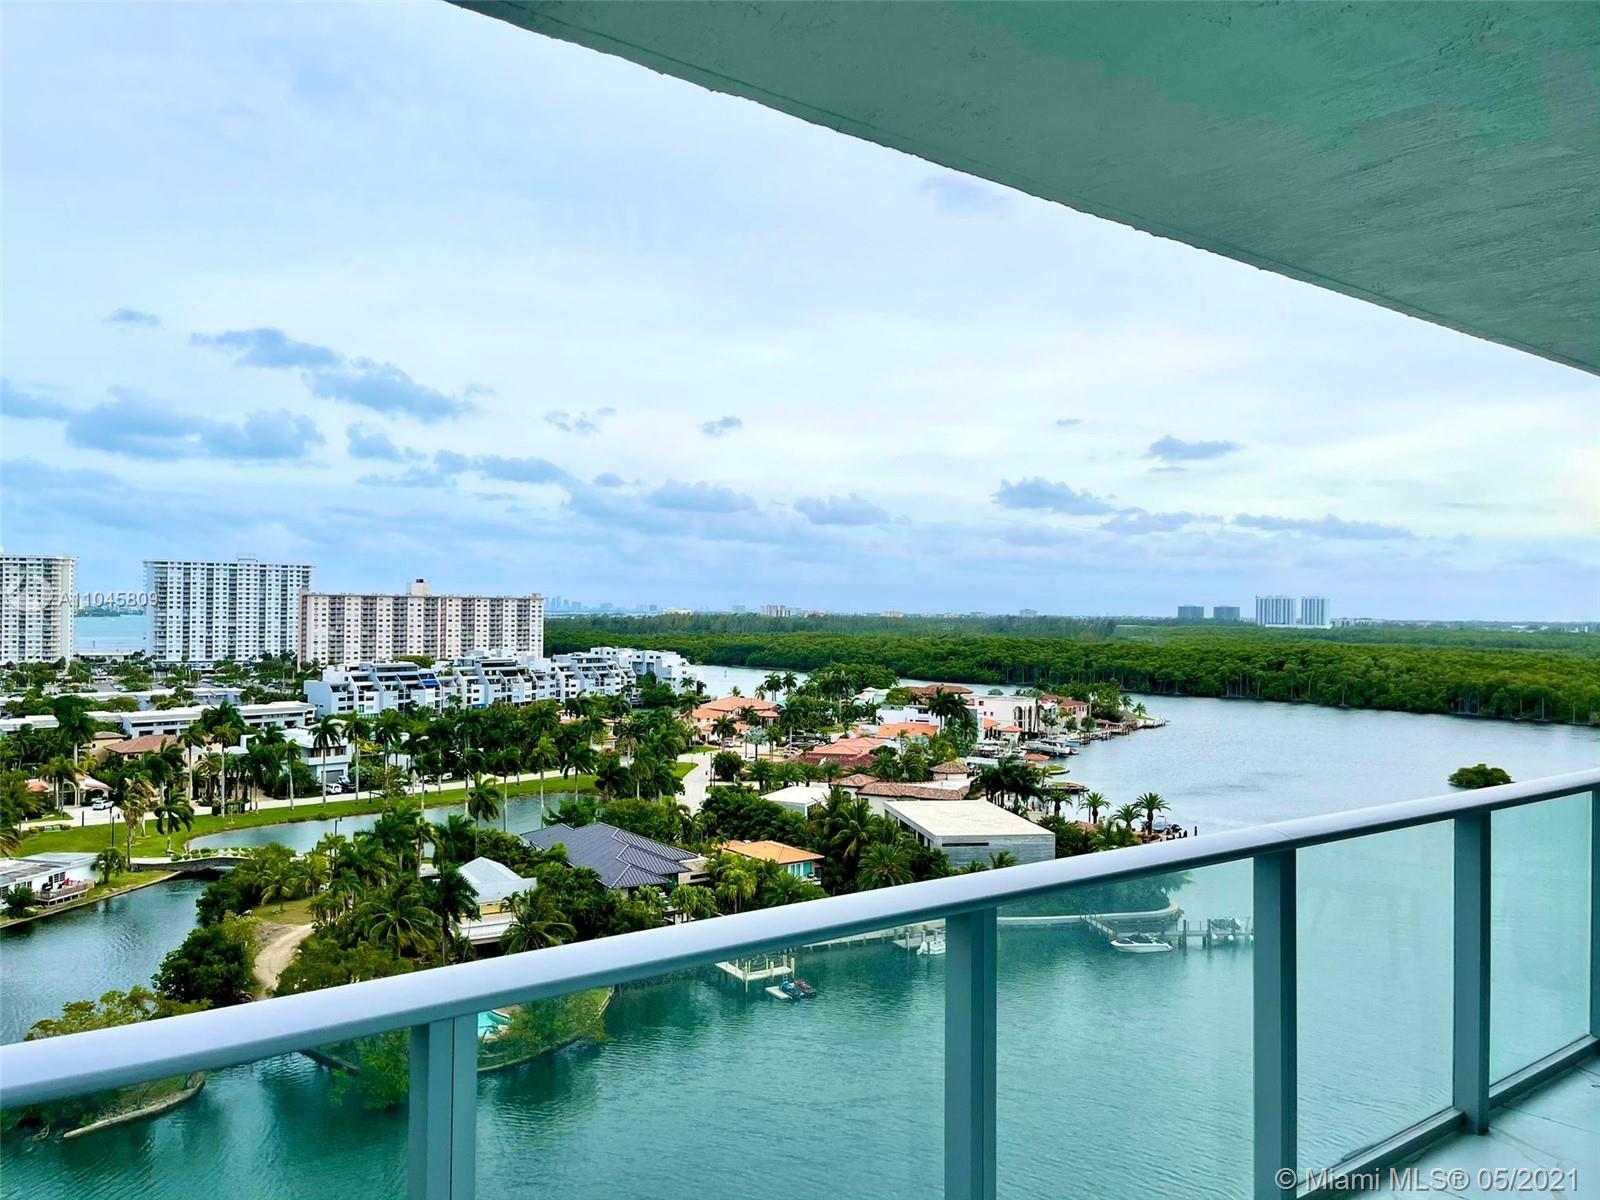 Parque Tower 2 #5-1208 - 330 Sunny Isles Blvd #5-1208, Sunny Isles Beach, FL 33160